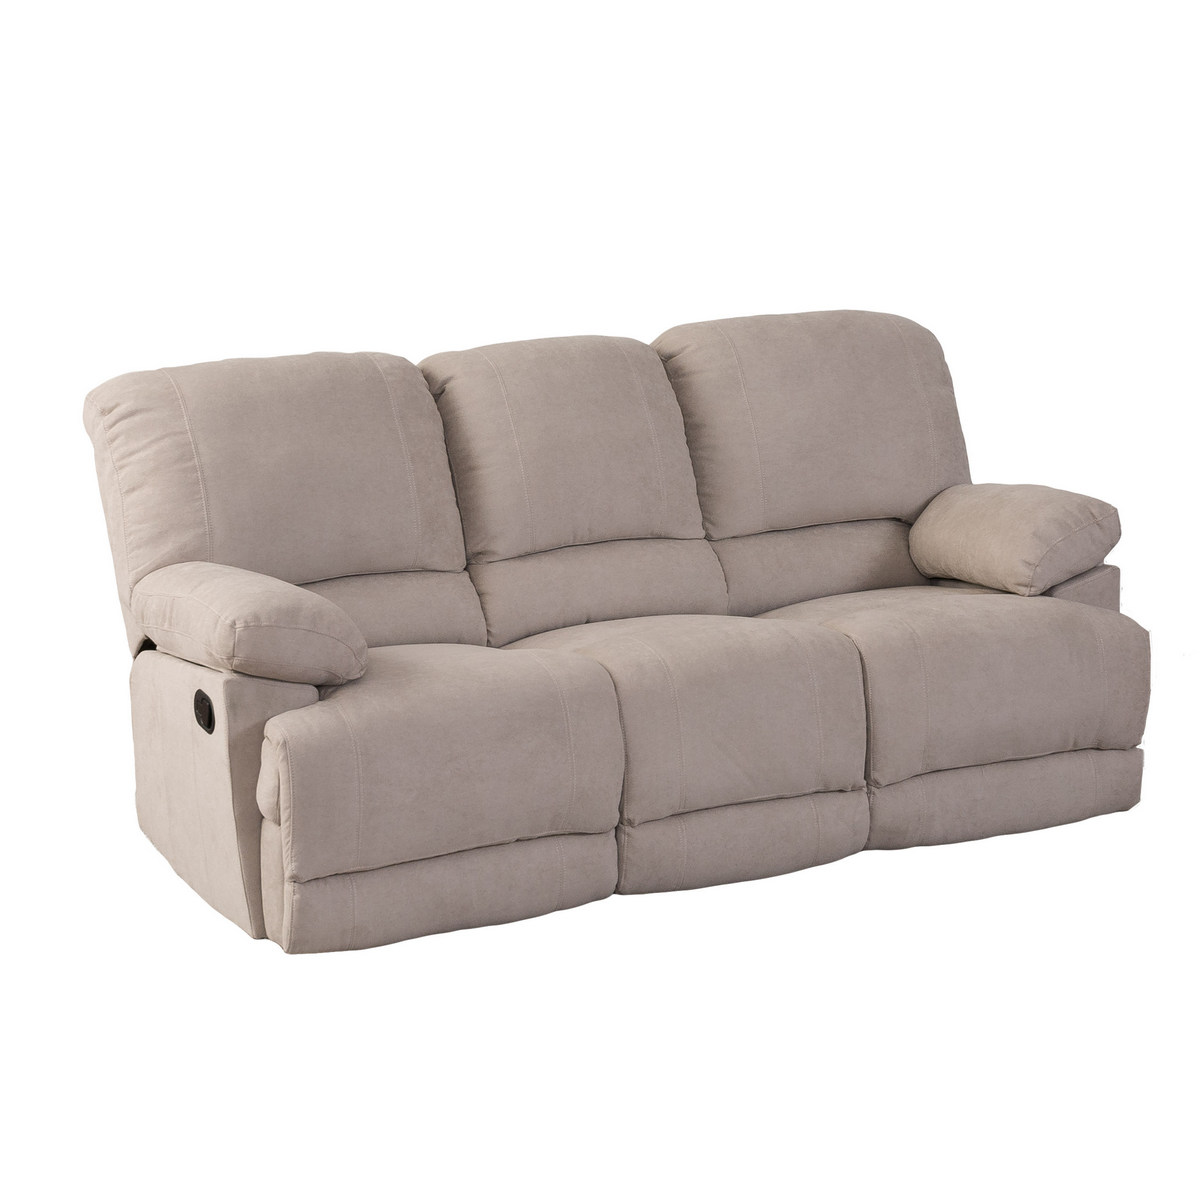 Corliving Reclining Sofa